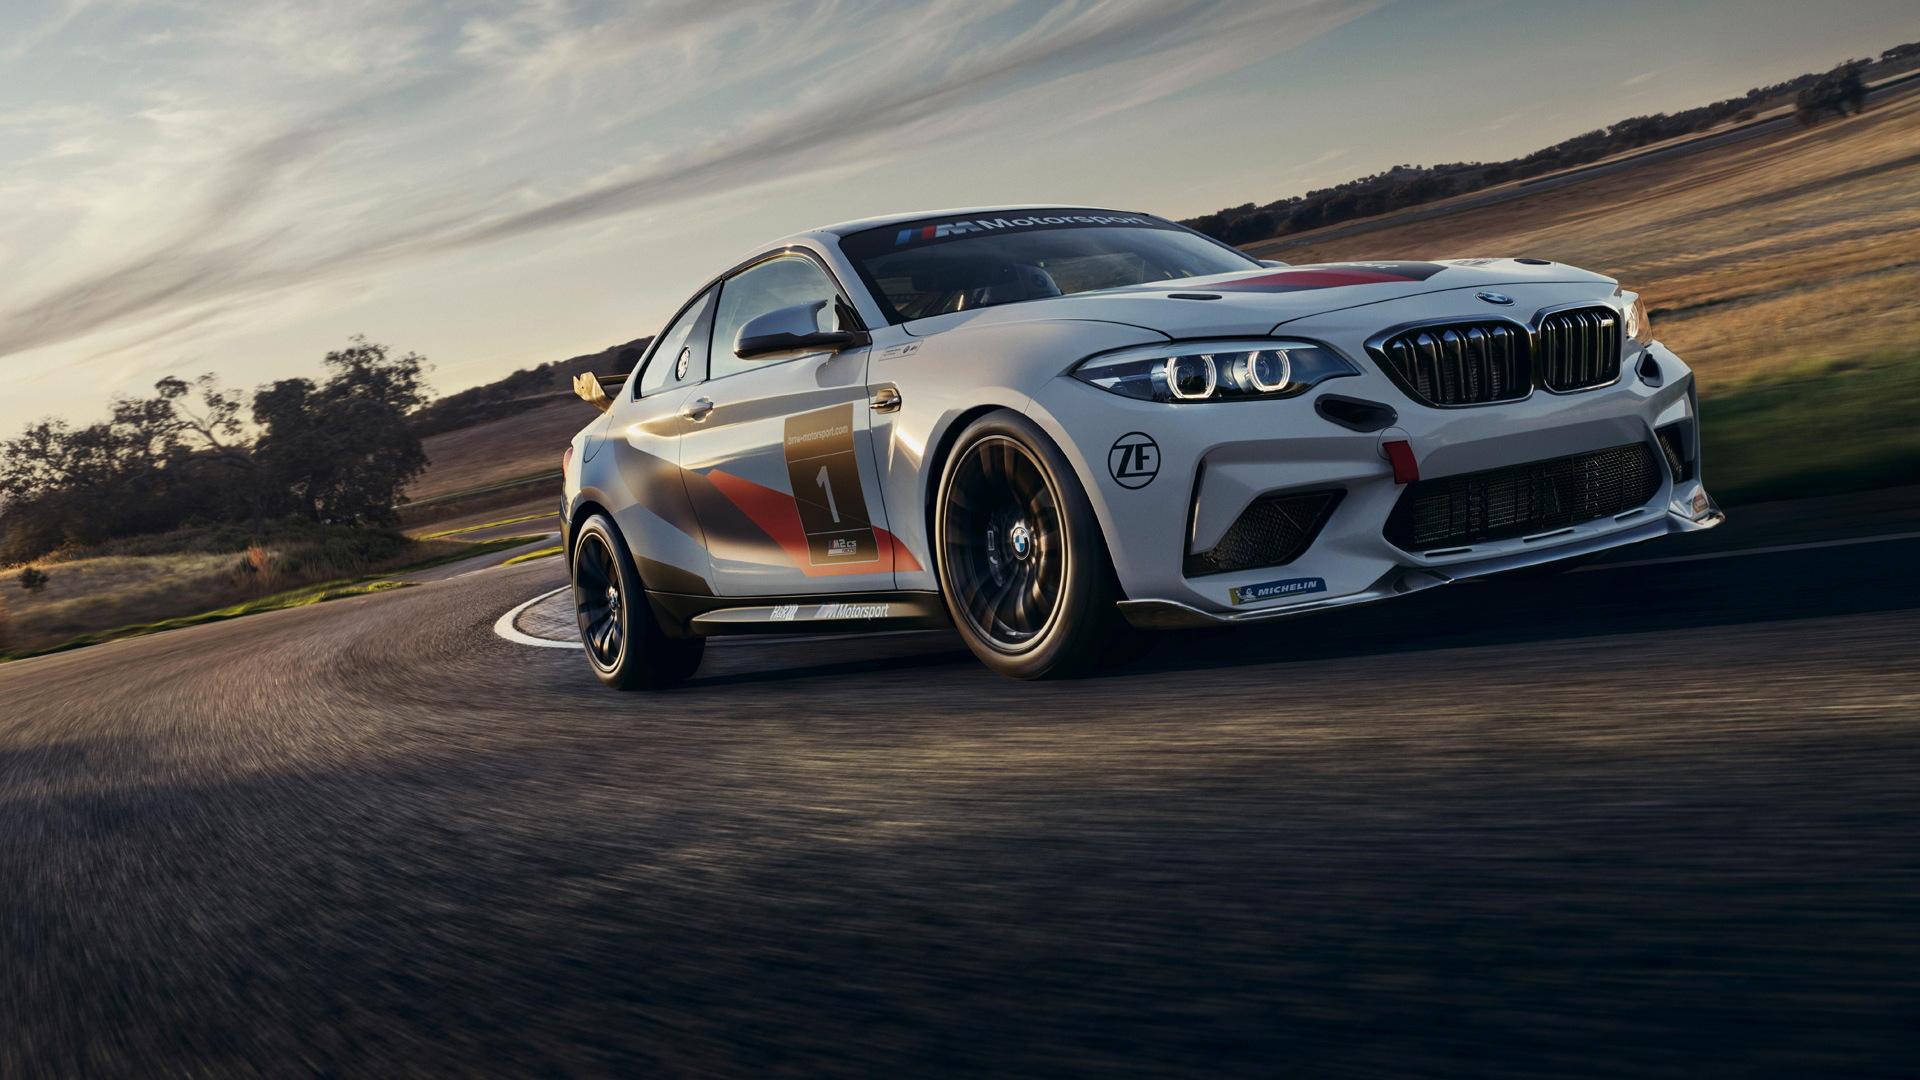 2020 BMW M2 CS Racing